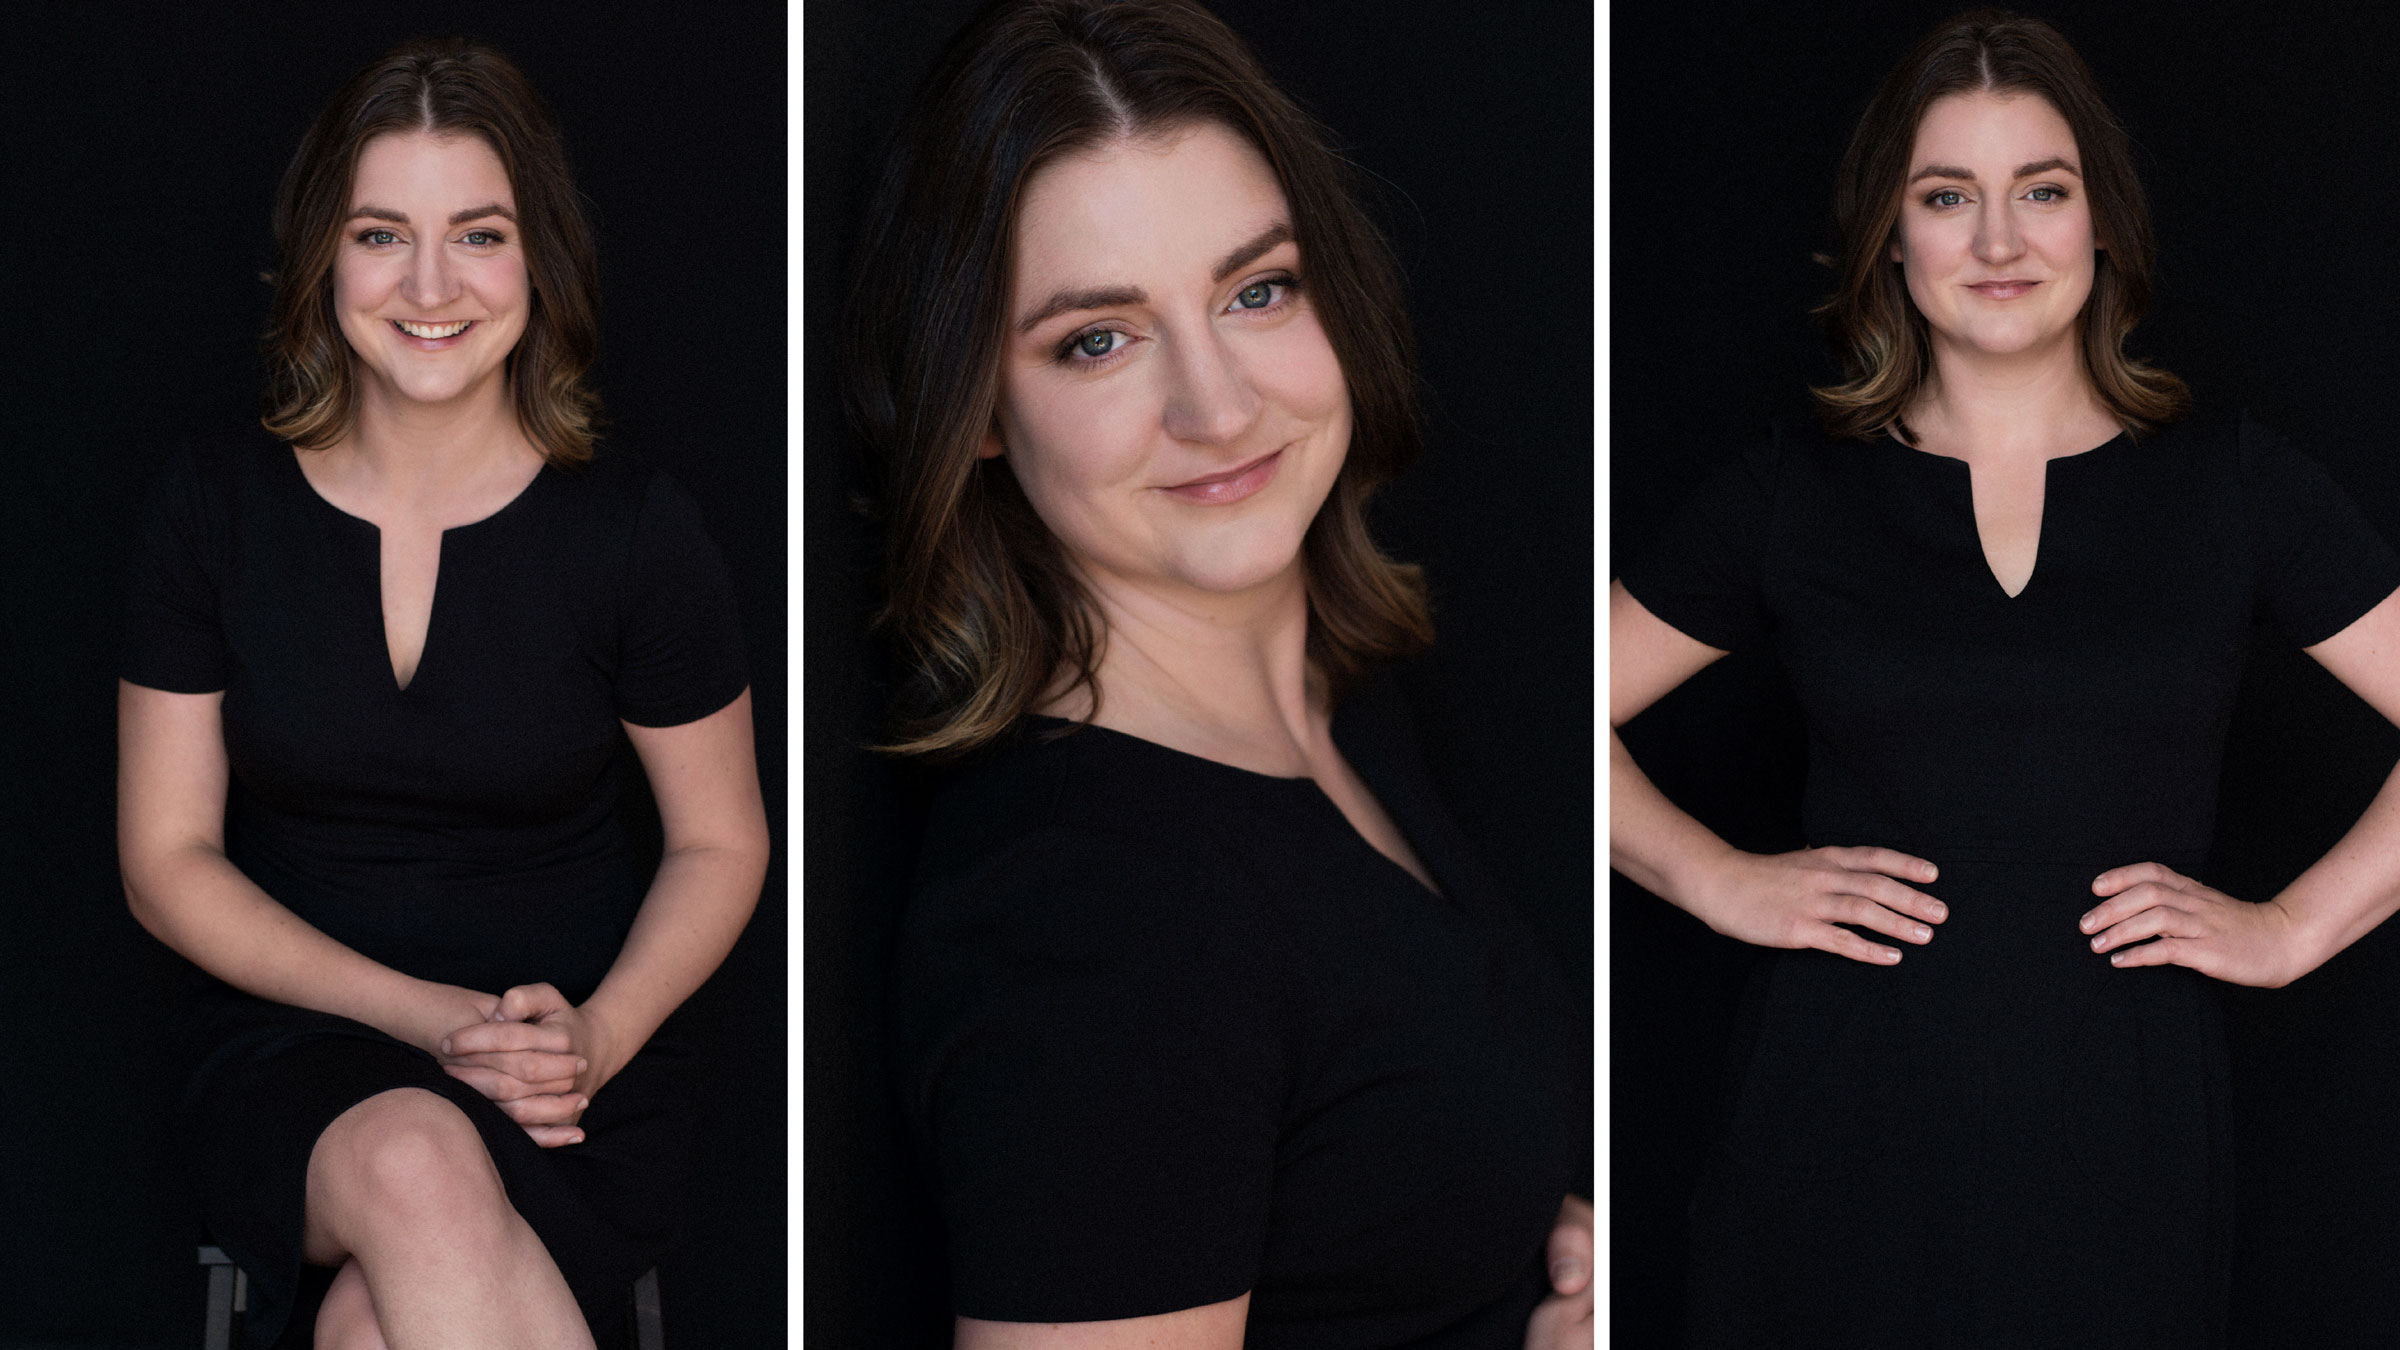 Charlotte-kensington-portraits-headshots-2.jpg